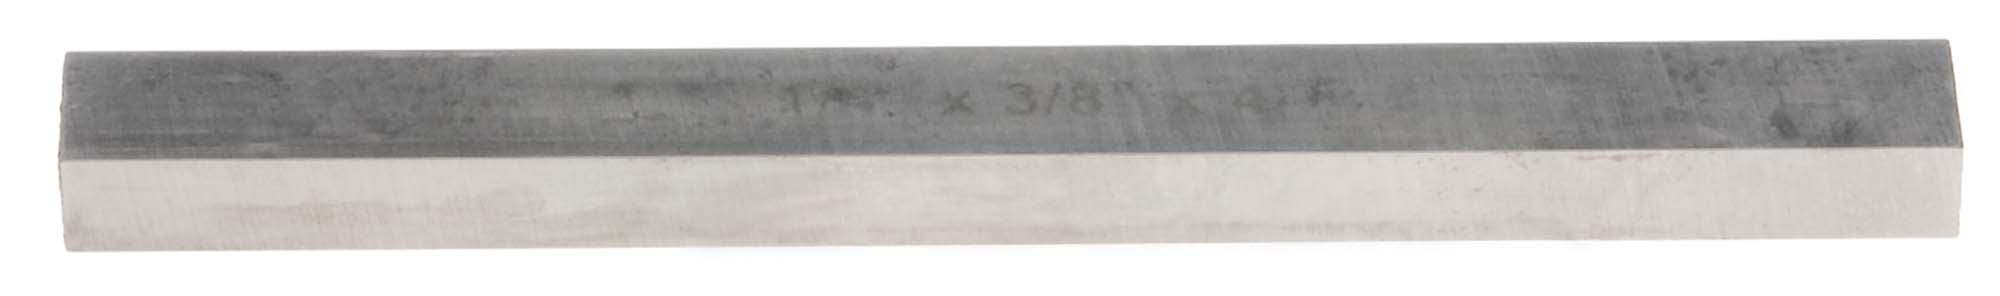 "1/4"" Square X 6"" Long 5% Cobalt Tool Bit"